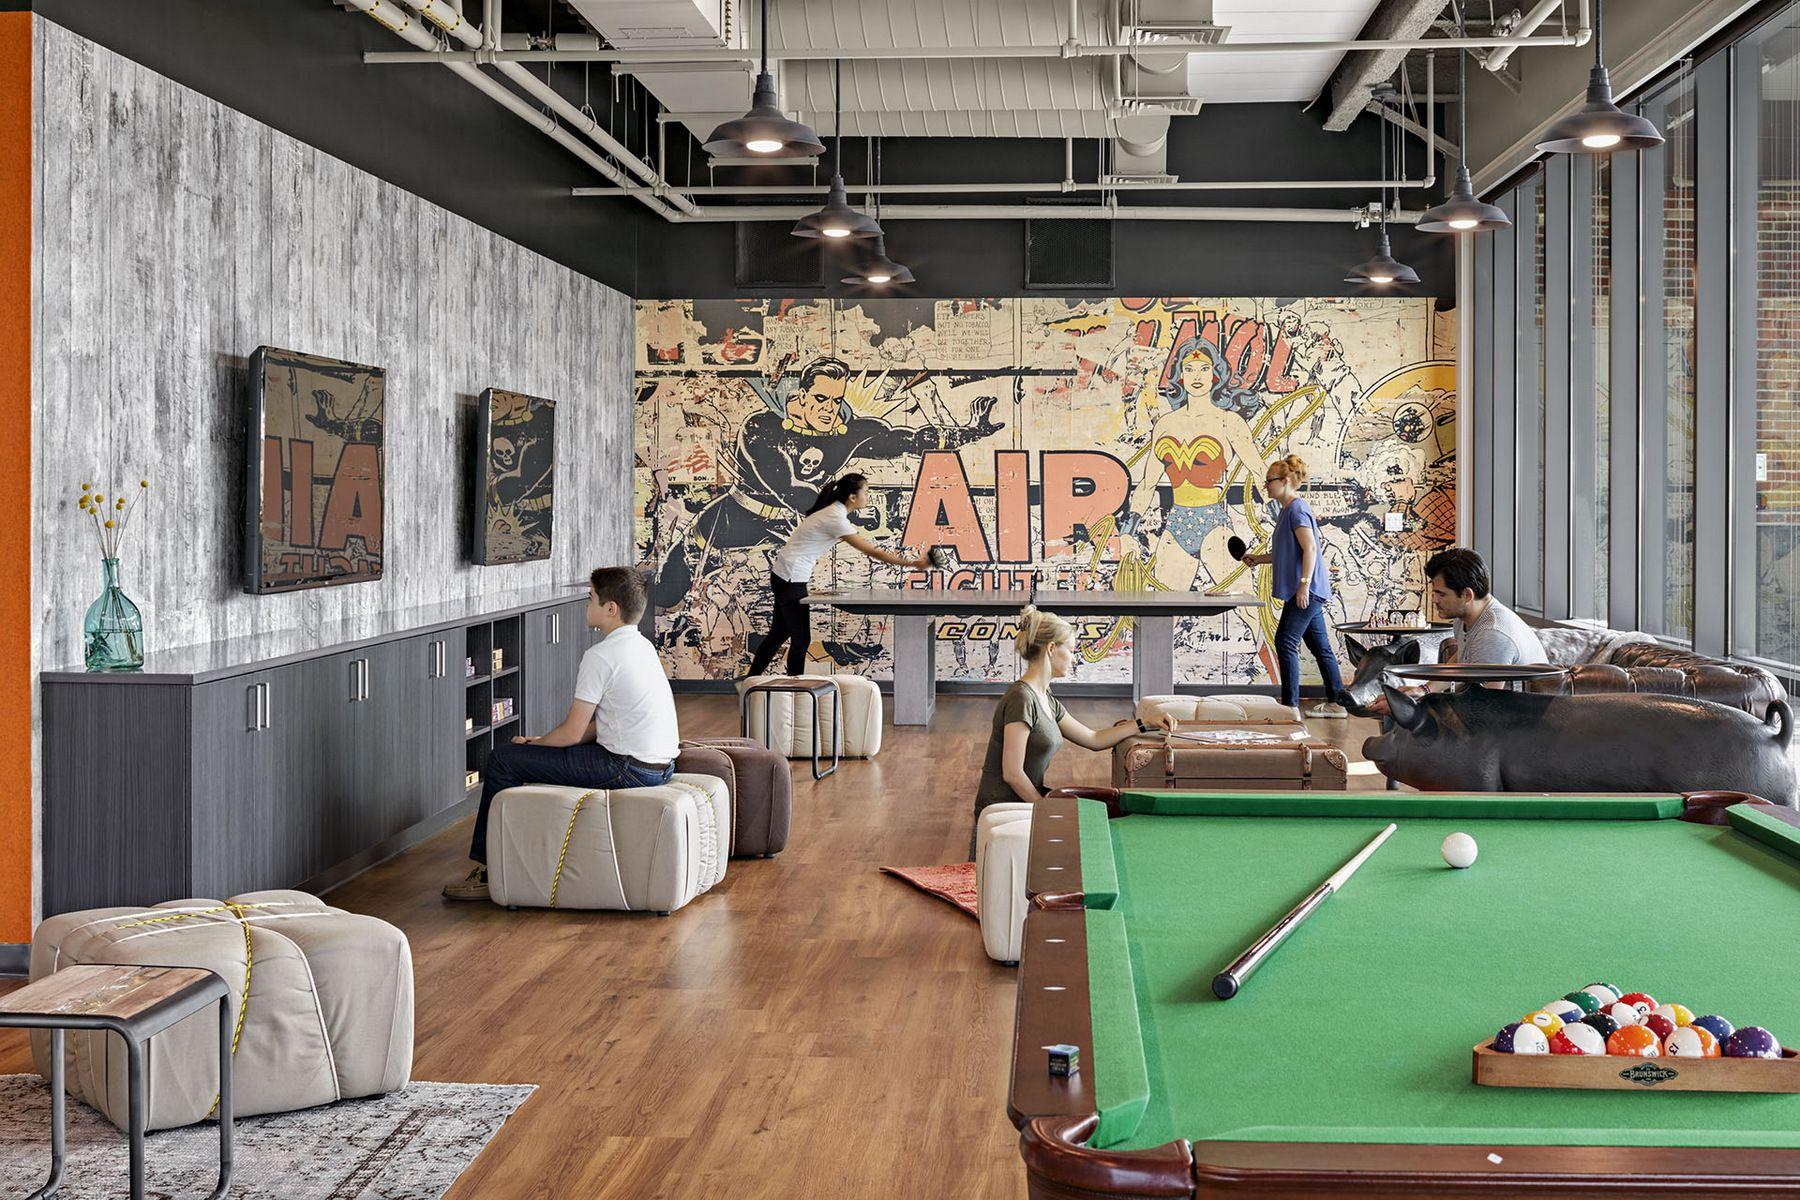 19 Tripadvisor Gameroom1 Office Snapshots Game Room Design Game Room Office Interior Design